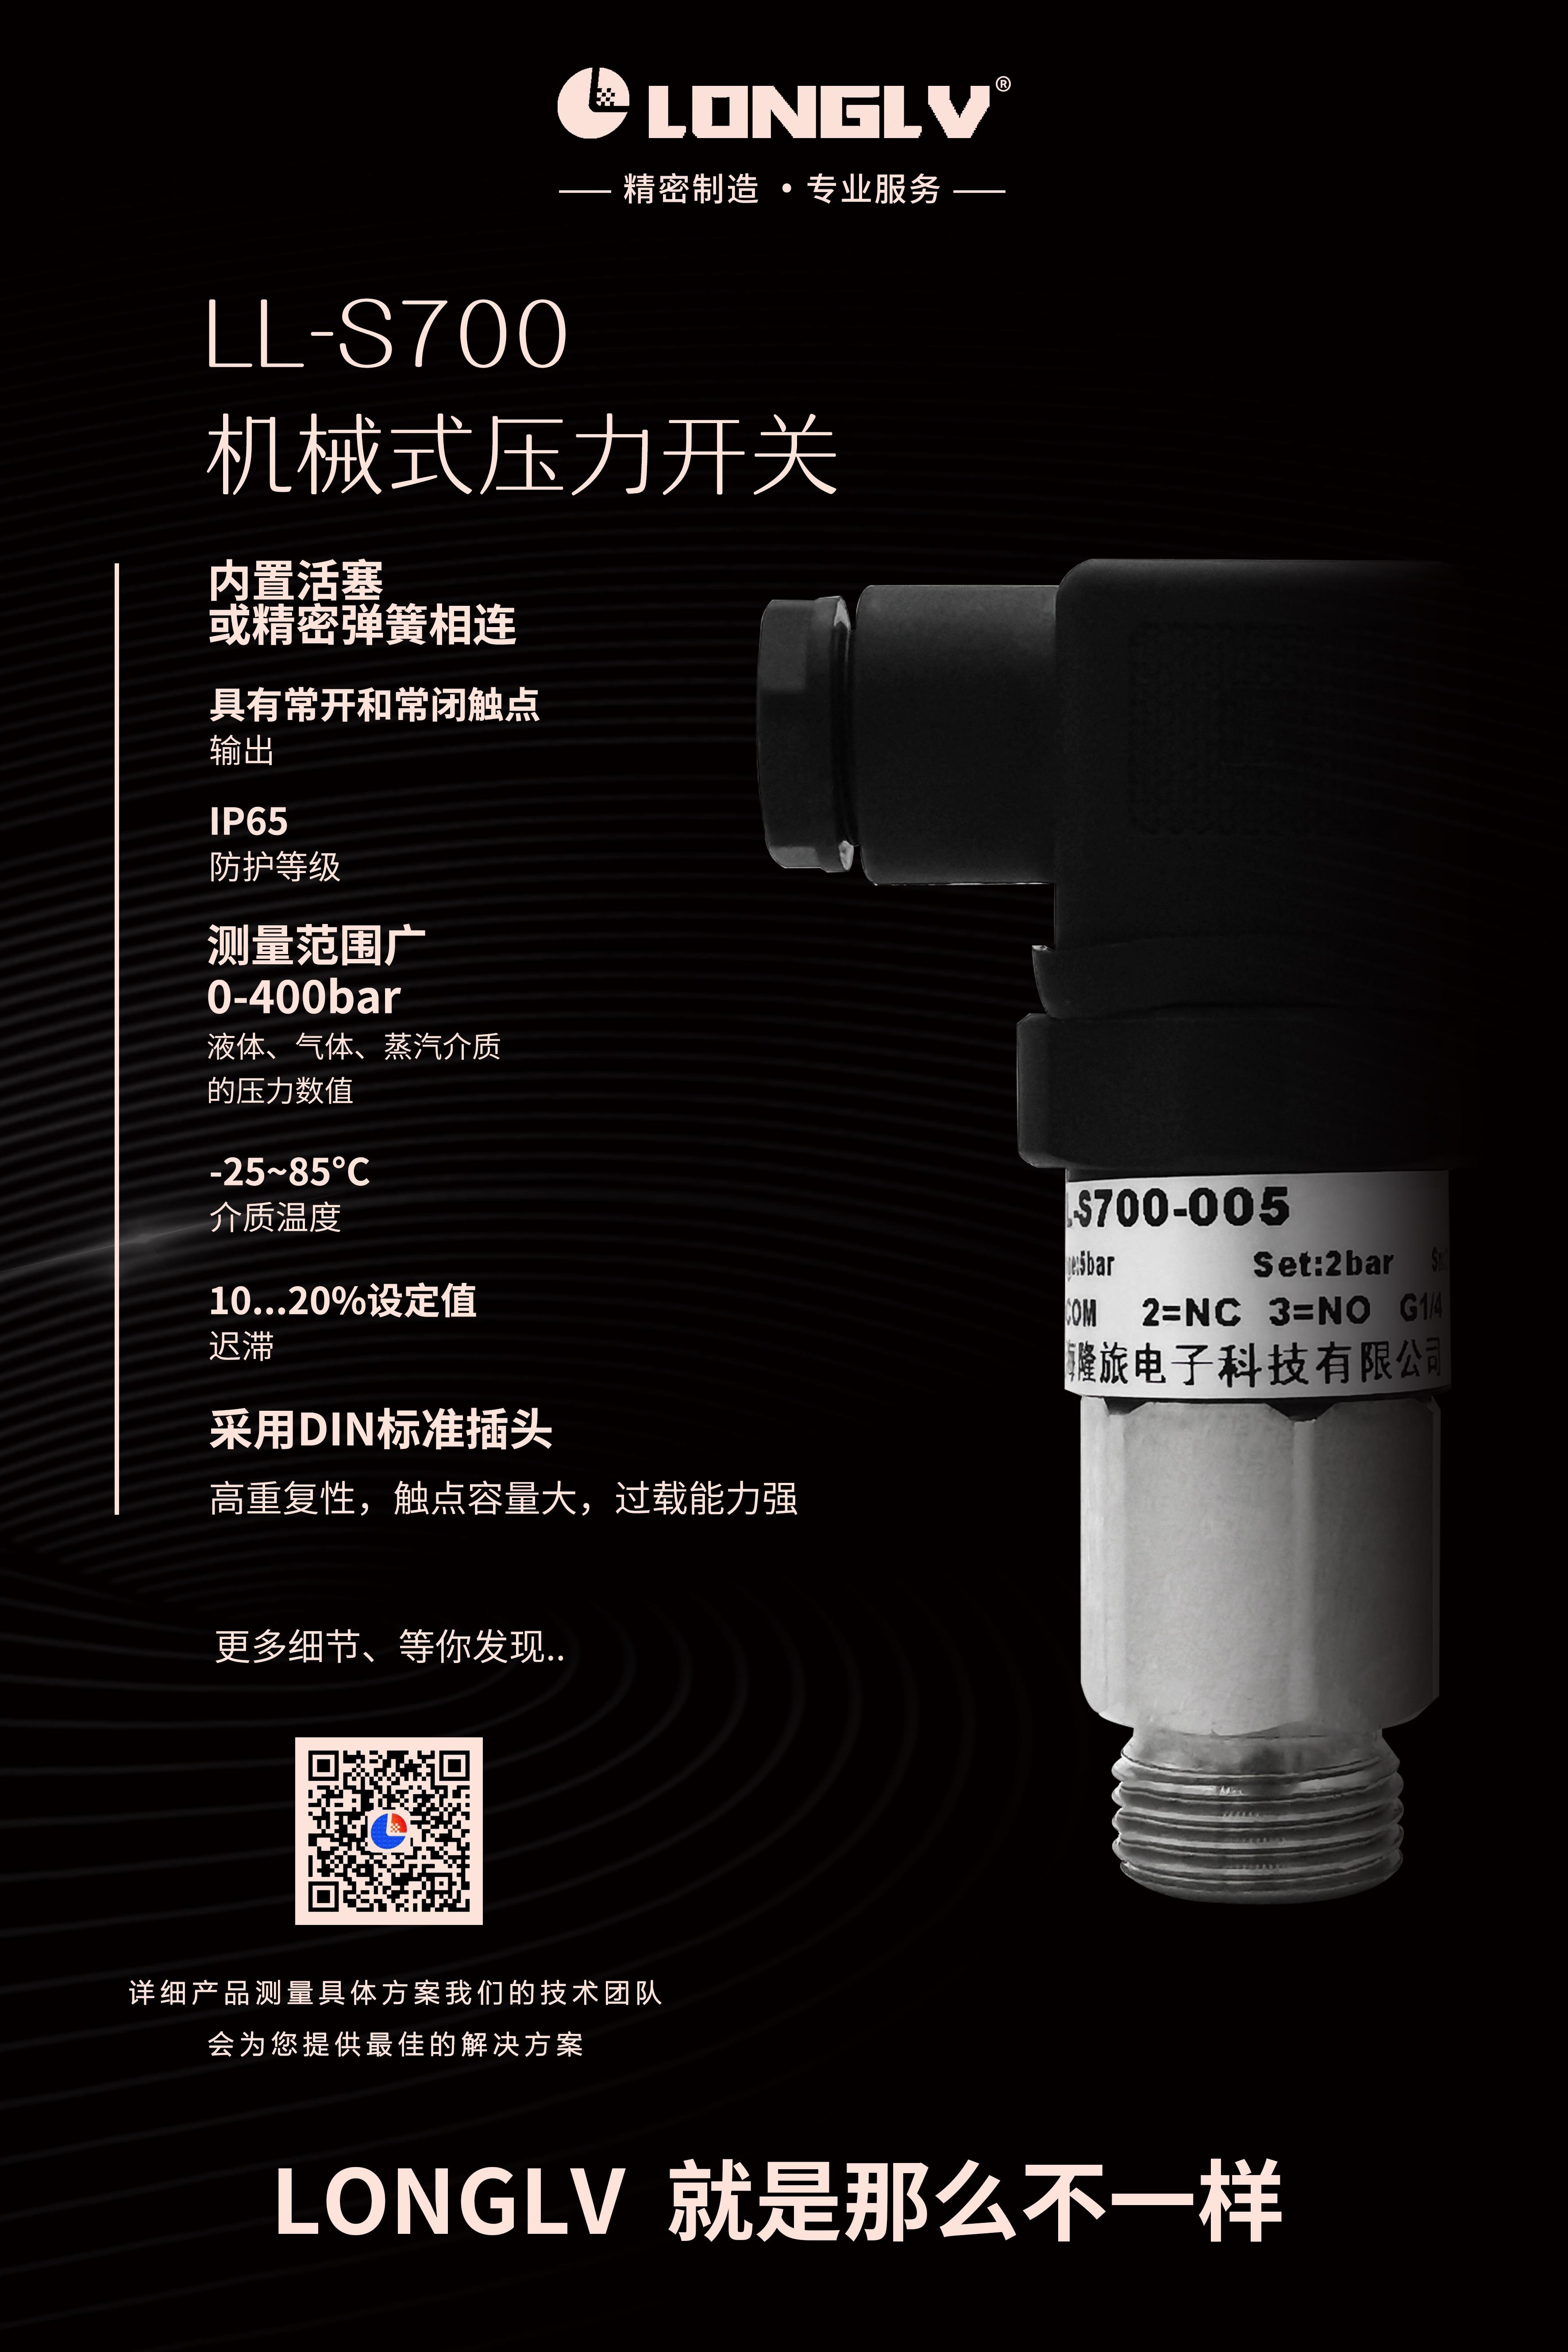 LL-S700宣传图